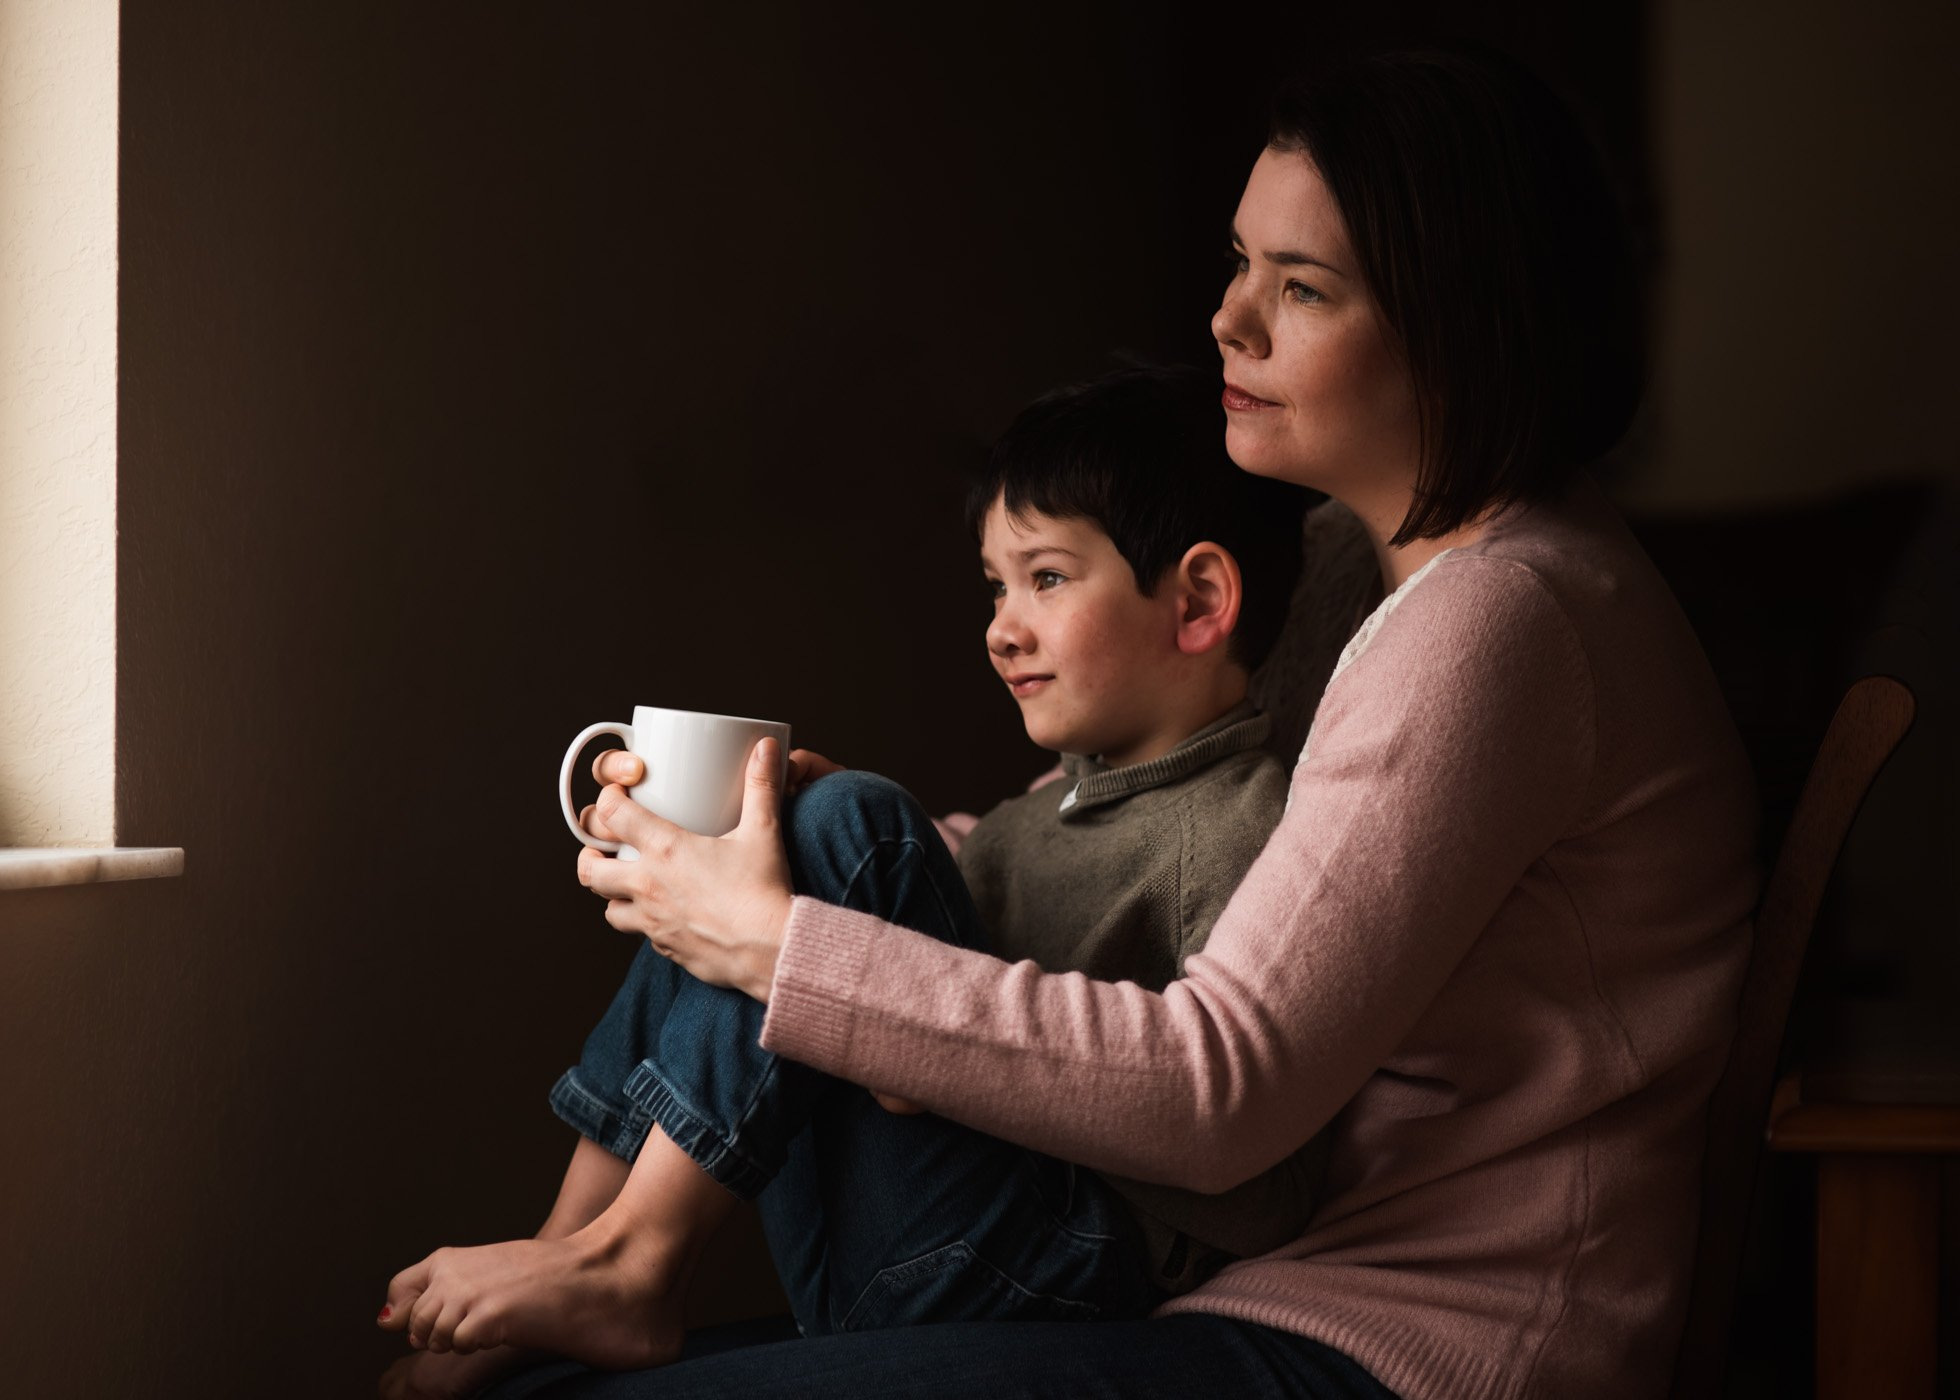 woman-sitting-with-son-holding-mug-sarah-gupta-50mm-lens